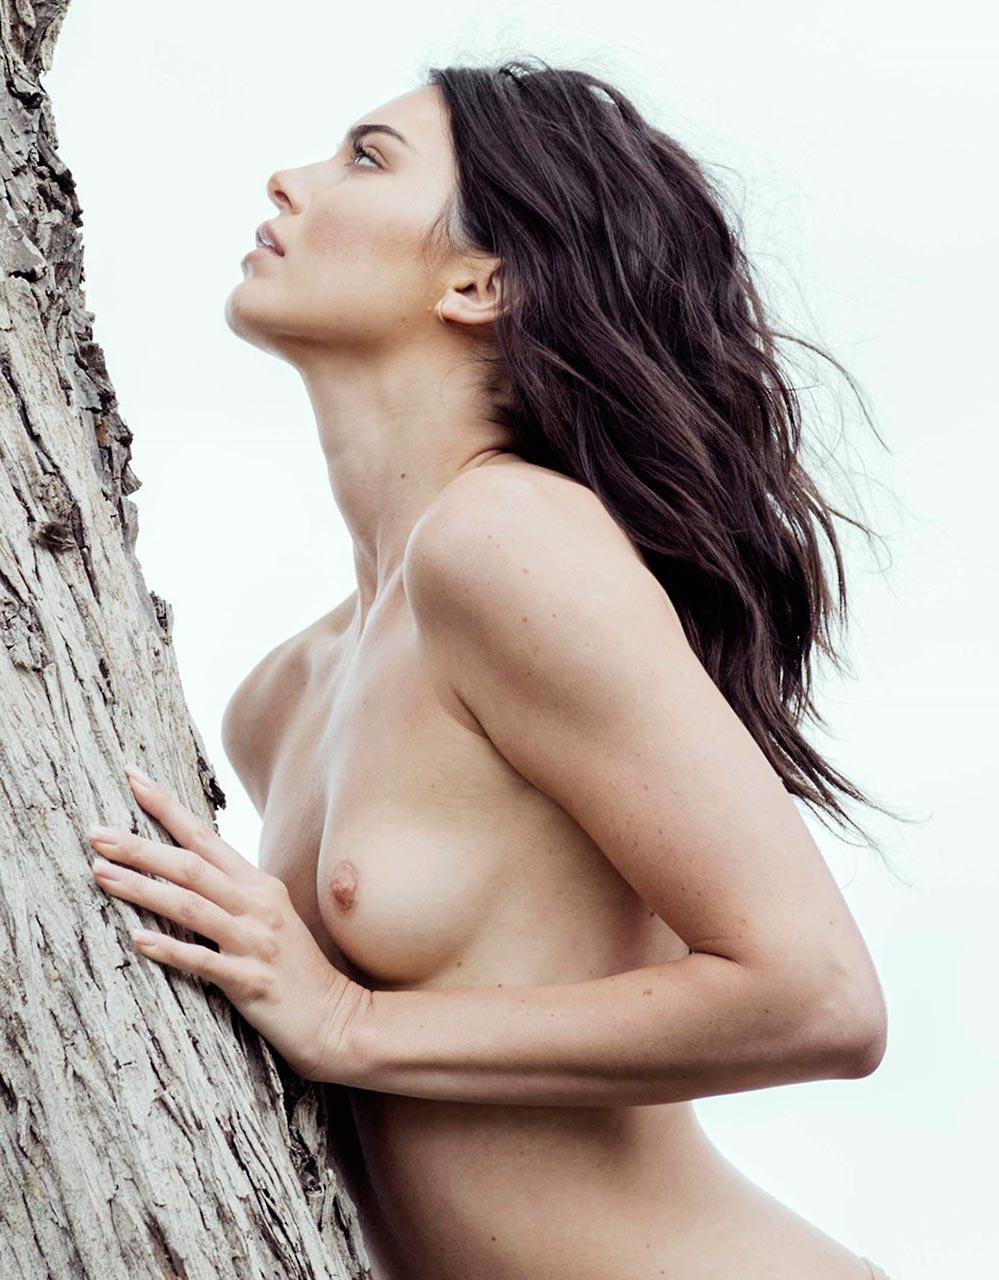 Kendall jenner nude photos naked sex pics